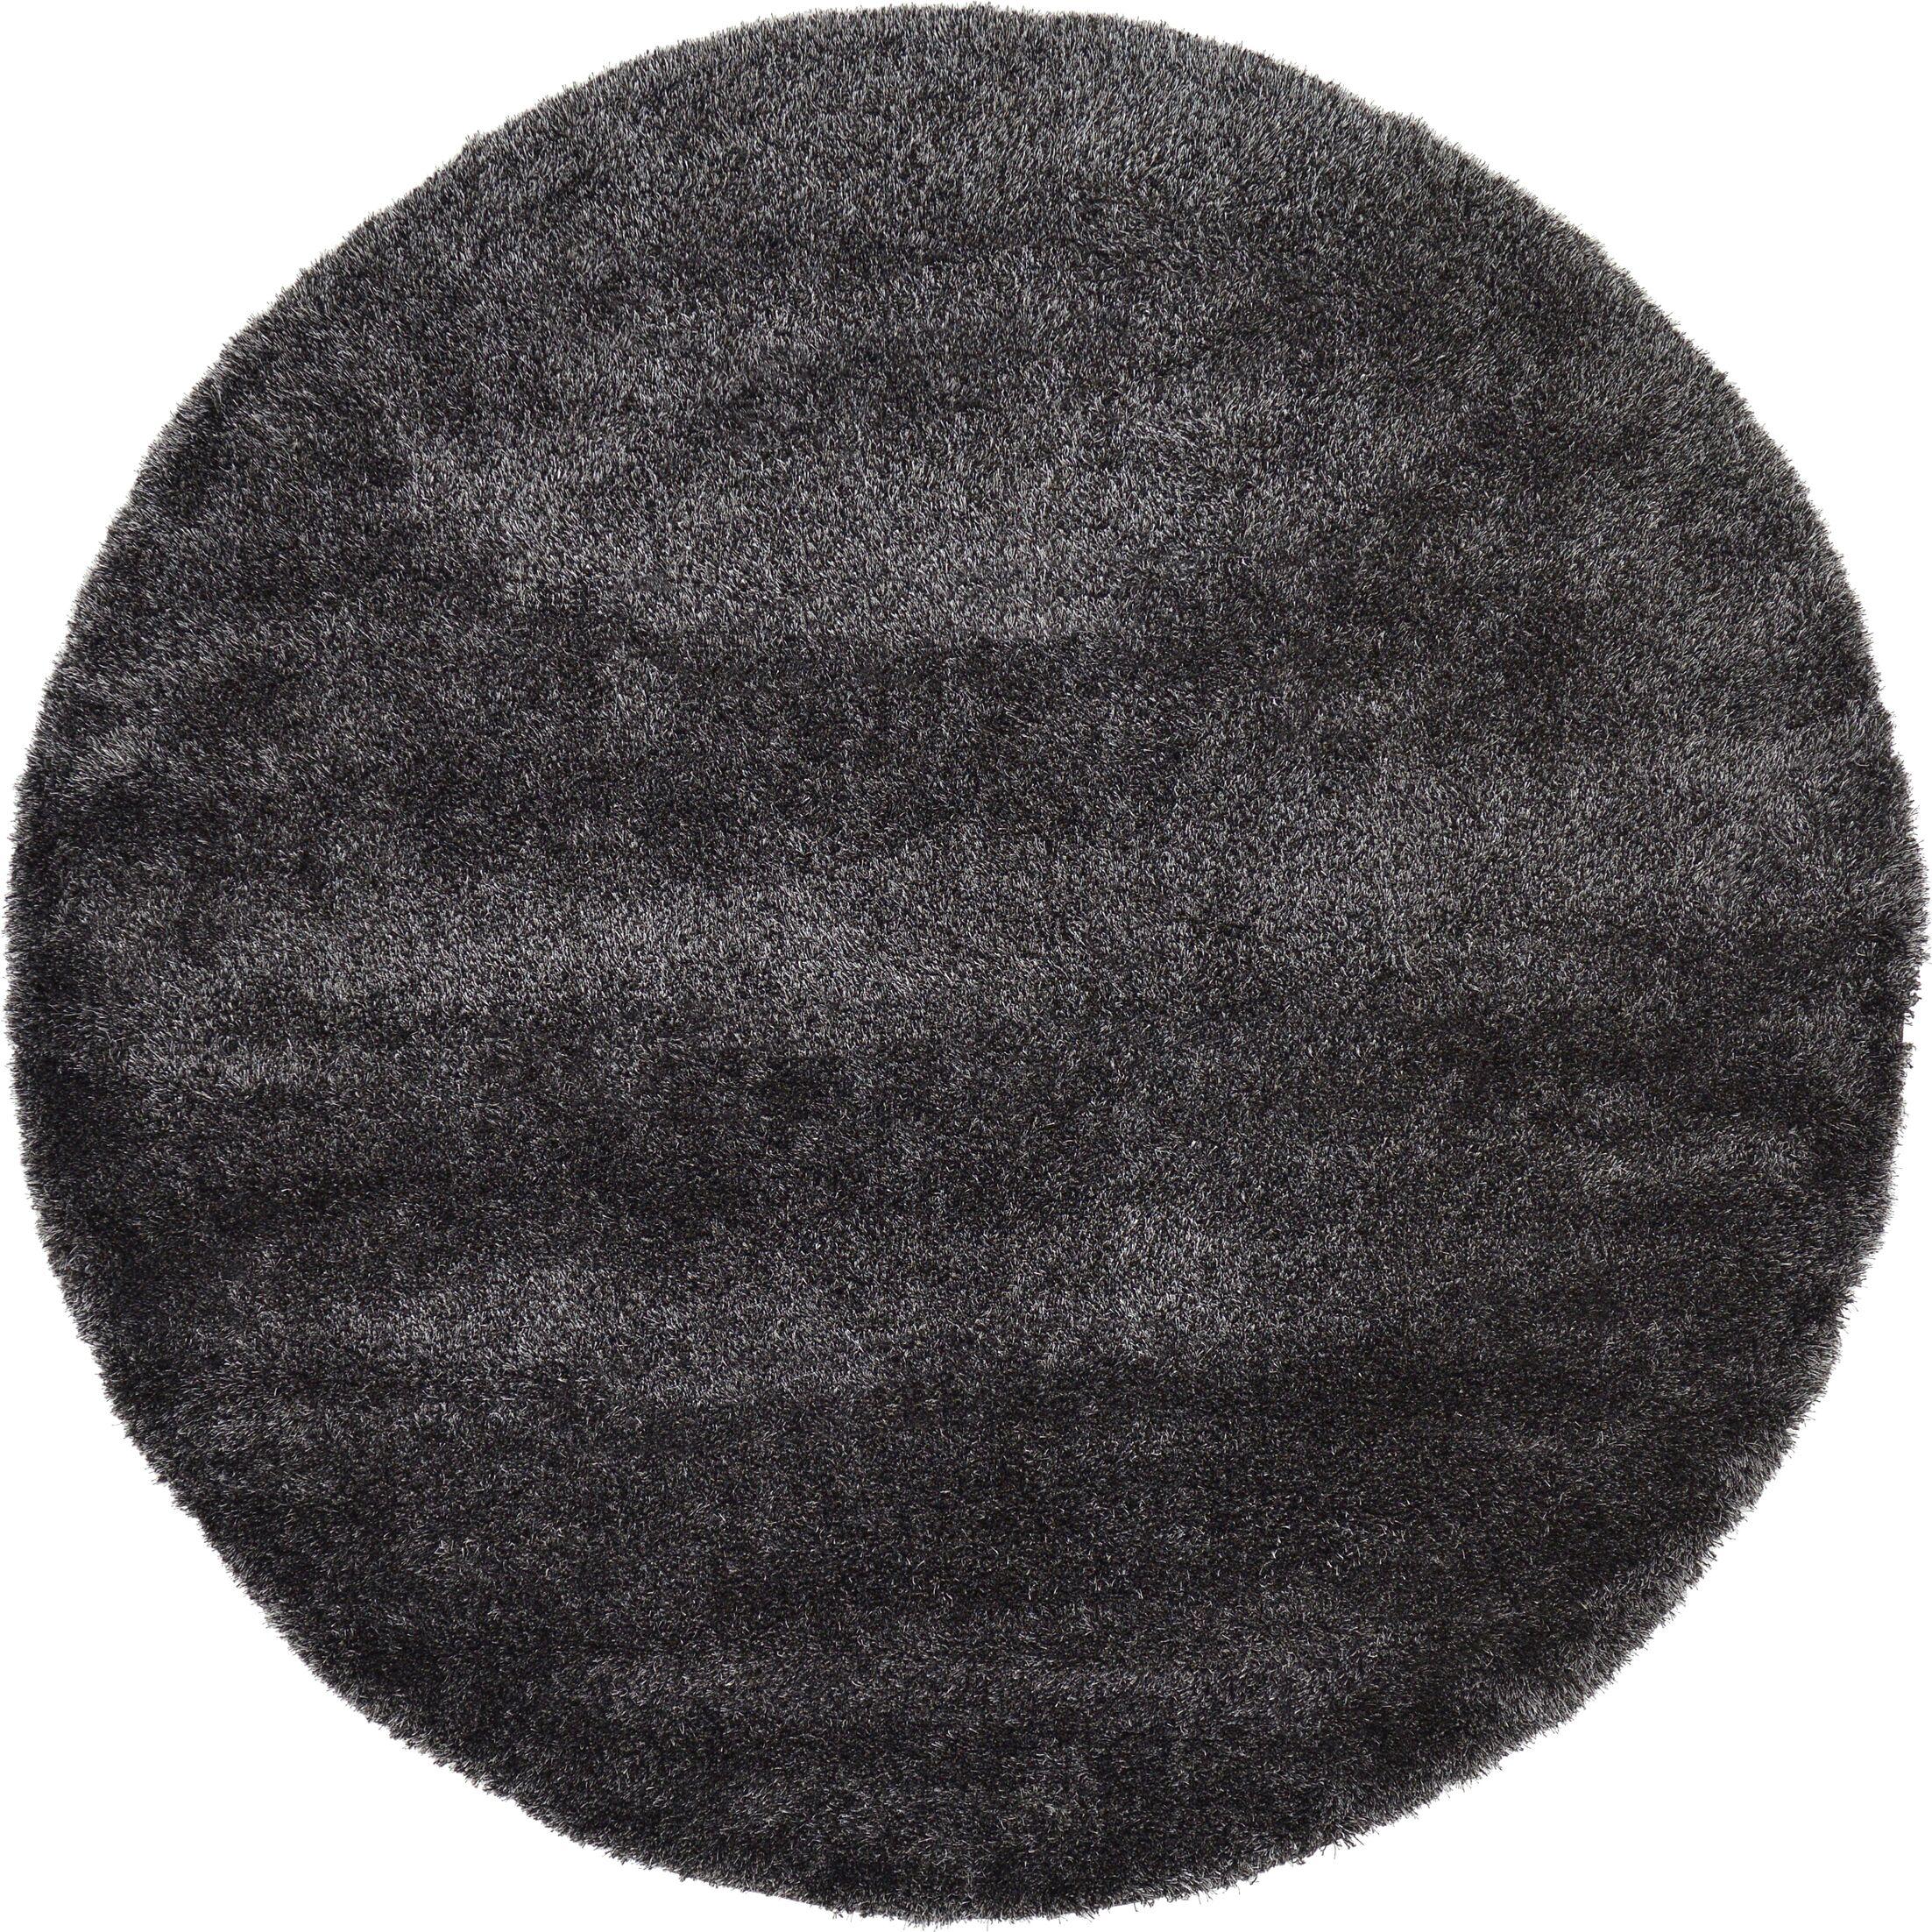 Evelyn Black Area Rug Rug Size: Round 8'